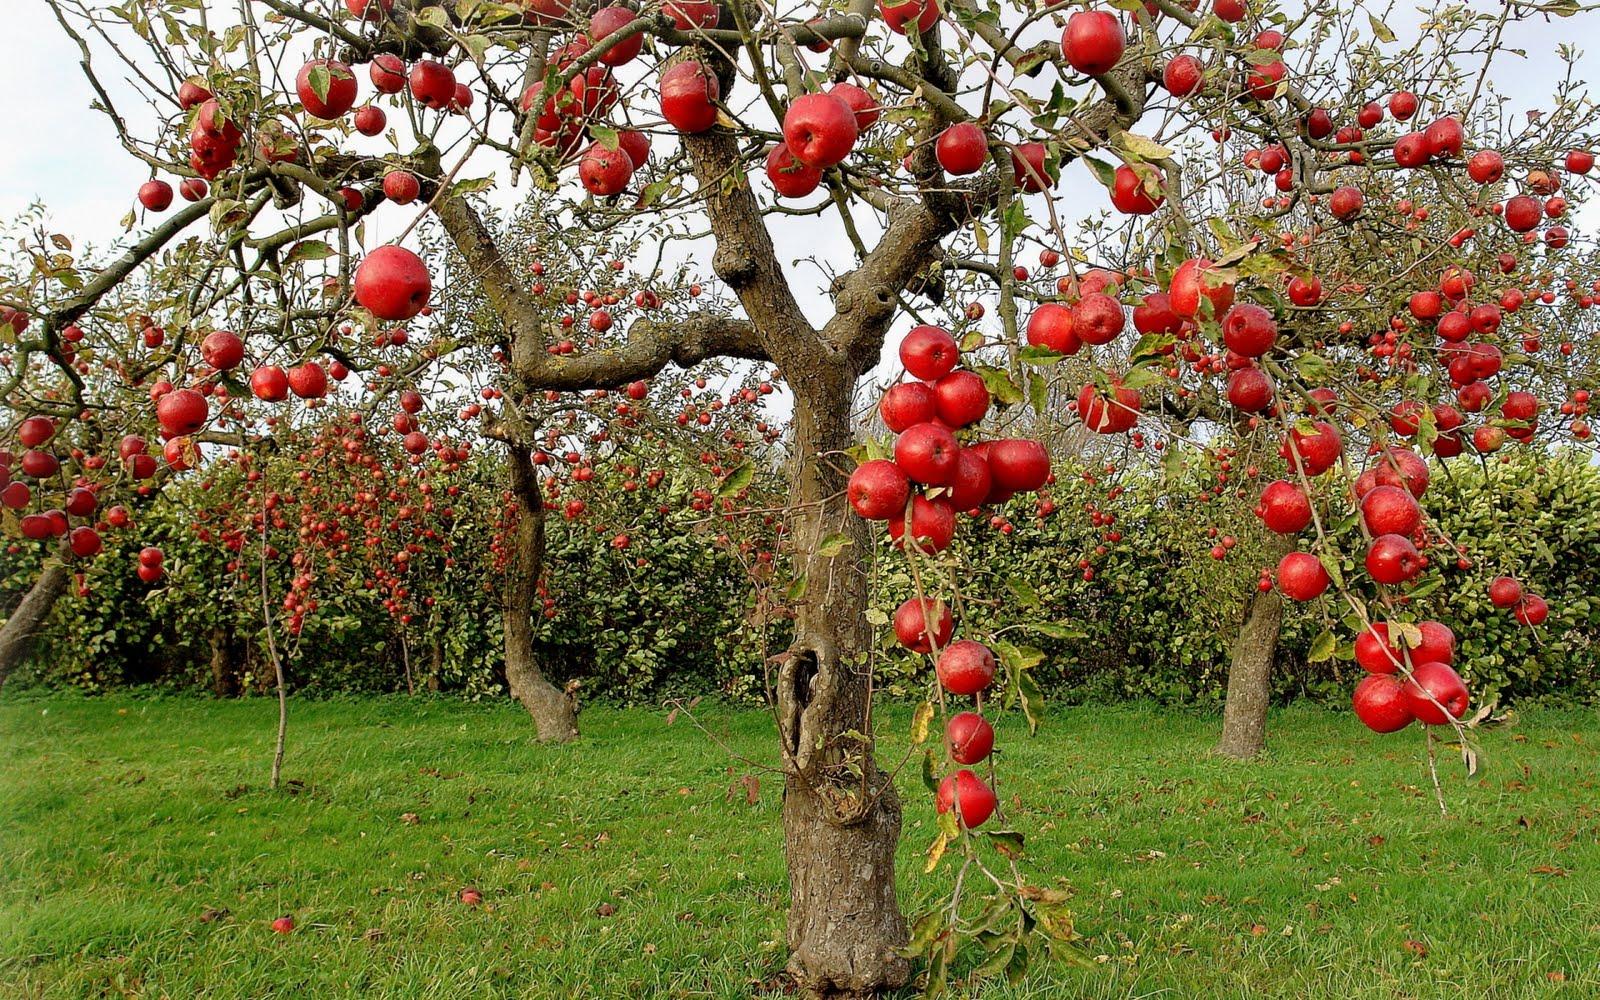 autumn-red-apples-1920x1200-manzanas-rojas-en-otoño